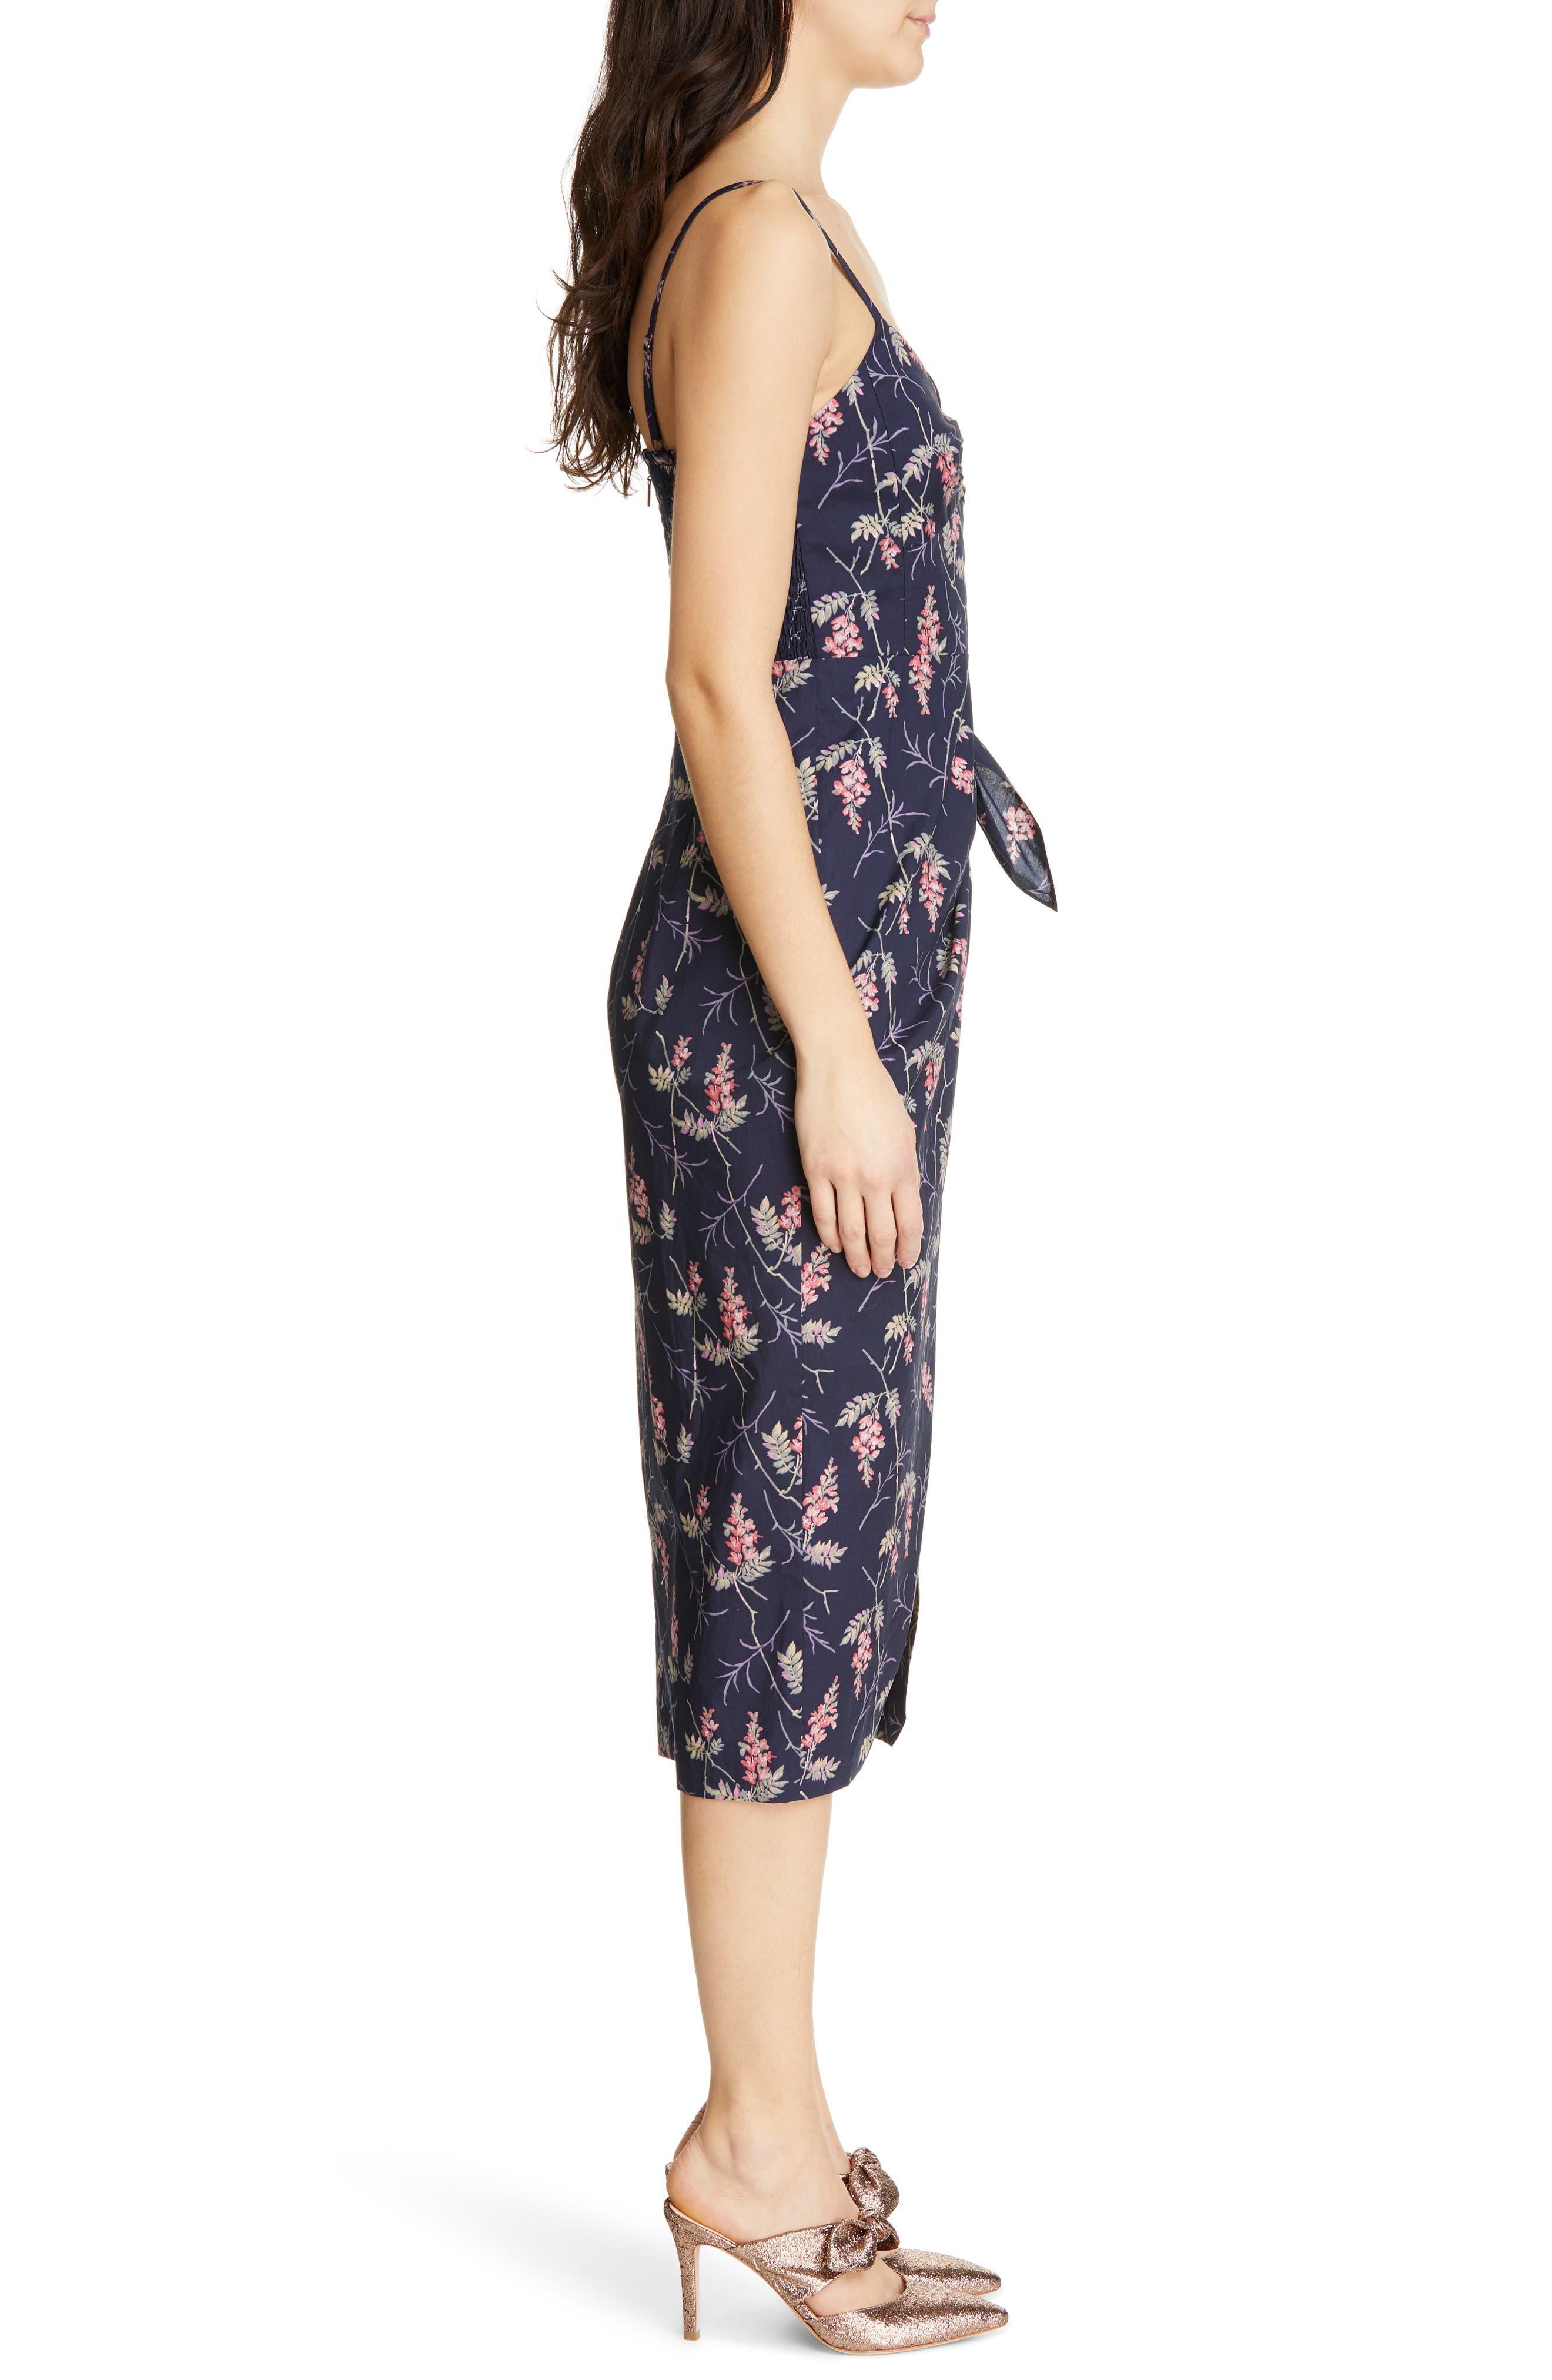 REBECCA TAYLOR, Ivie Floral Sleeveless Cotton Midi Sundress, Alternate thumbnail 4, color, NAVY COMBO